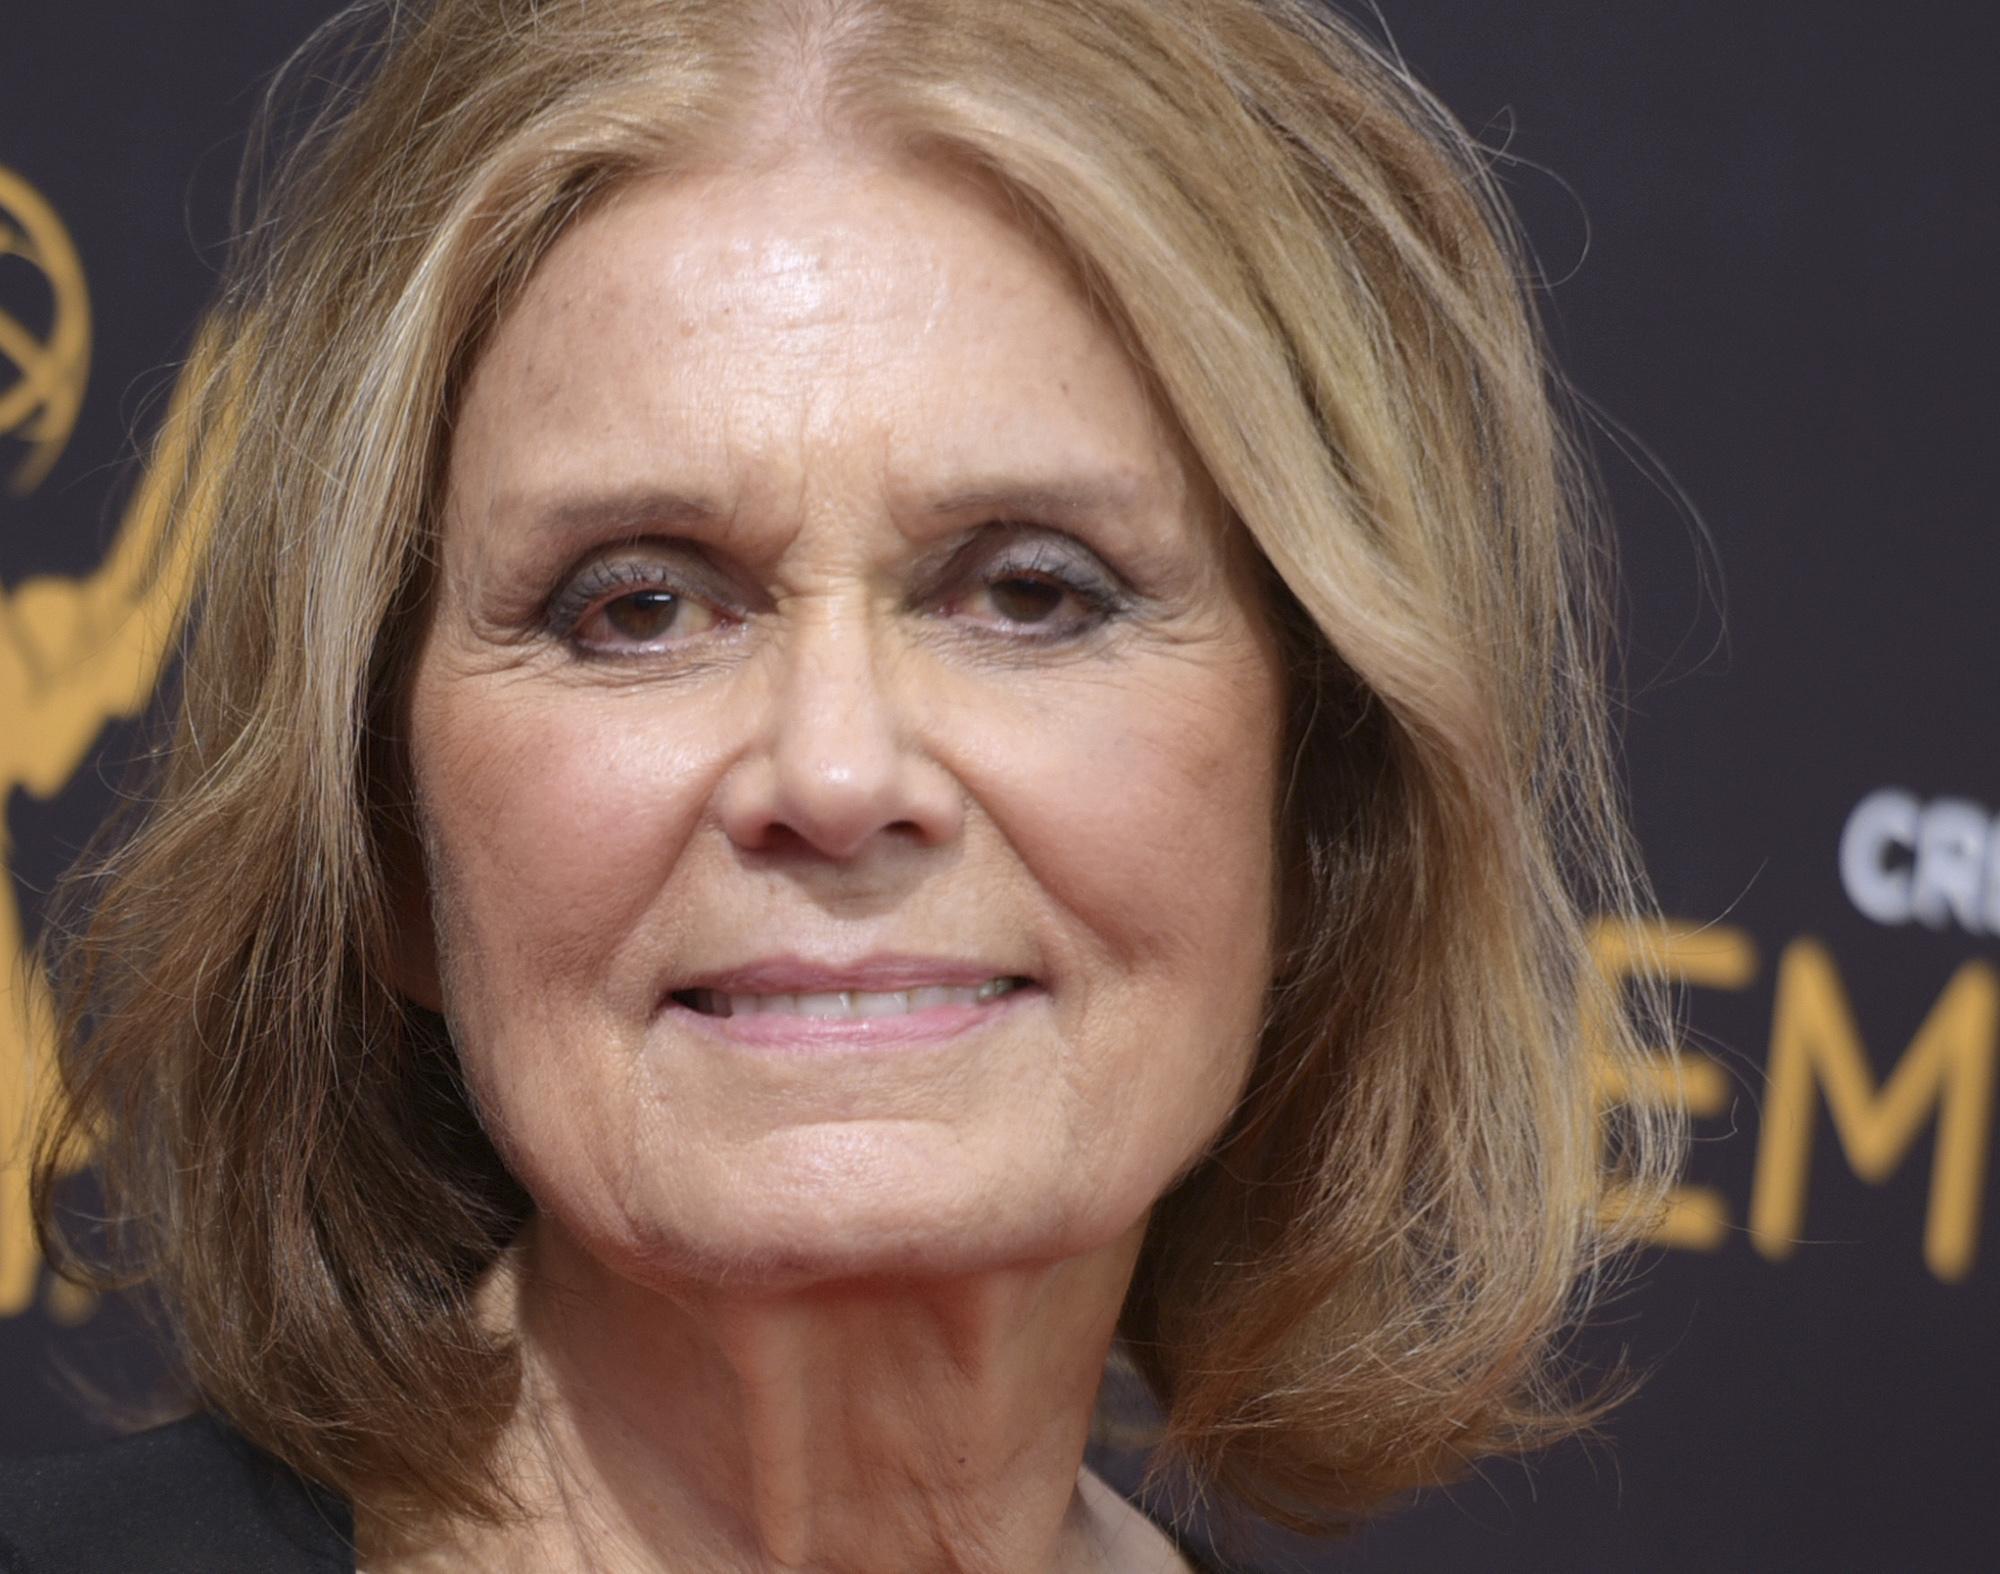 Steinem, Streep headline women's conference in Boston